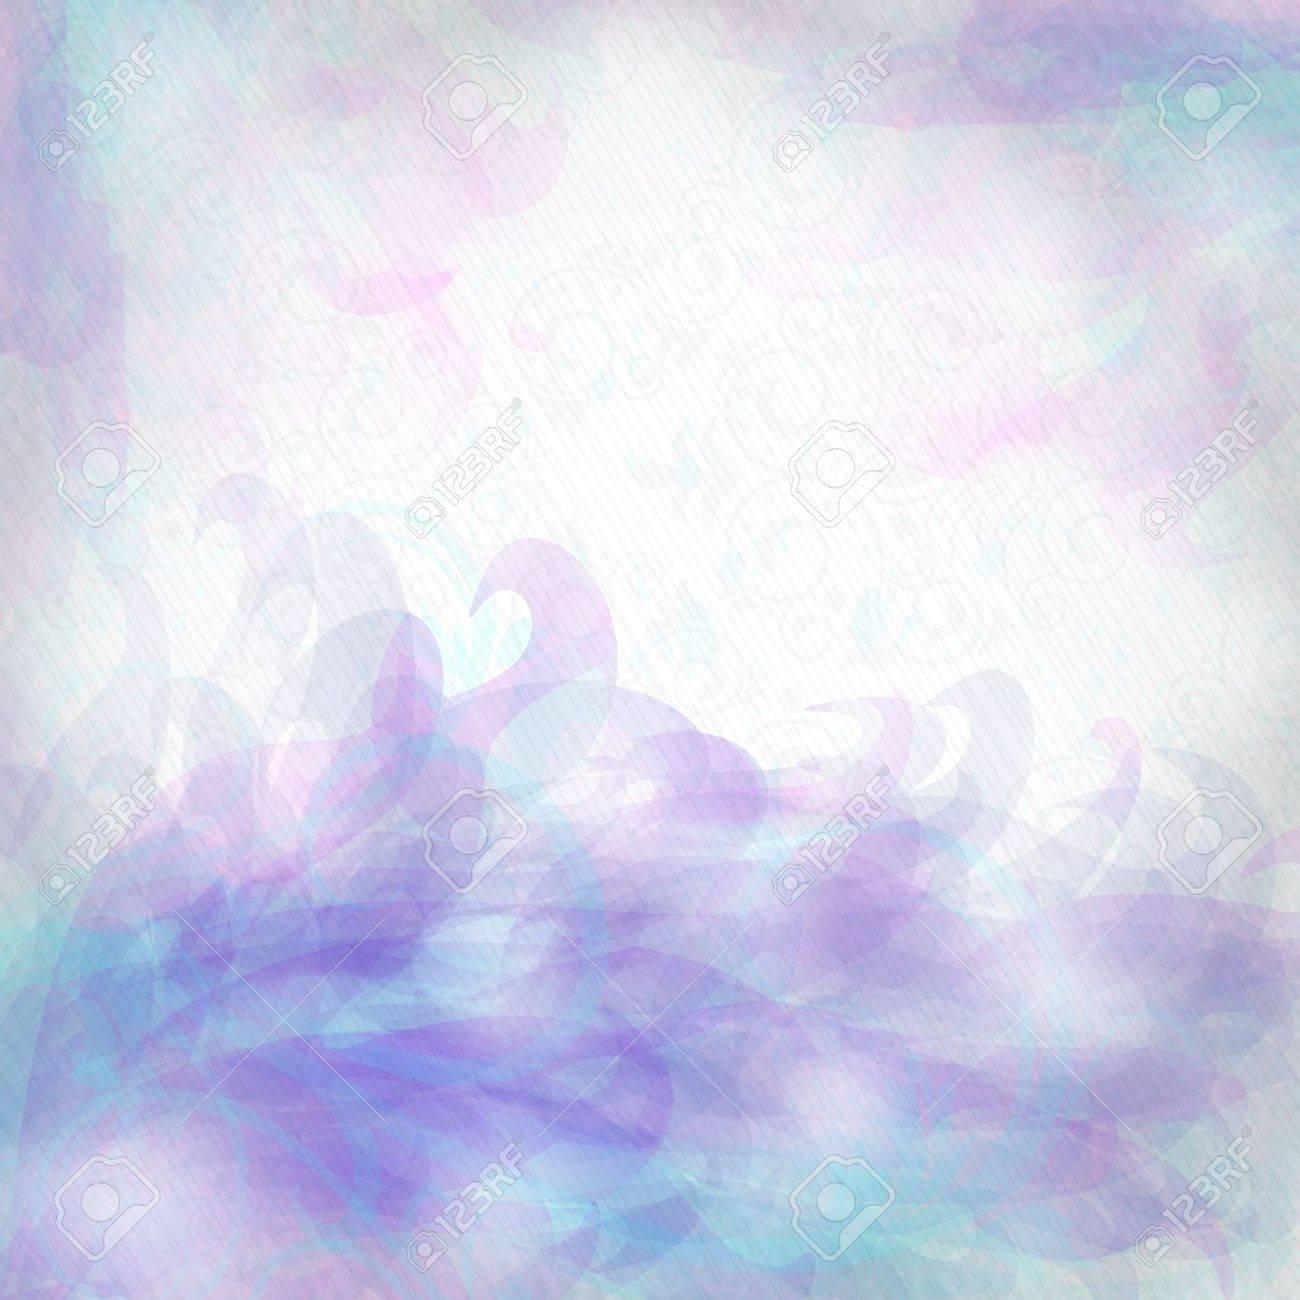 Romantic Background Stock Vector - 10495773